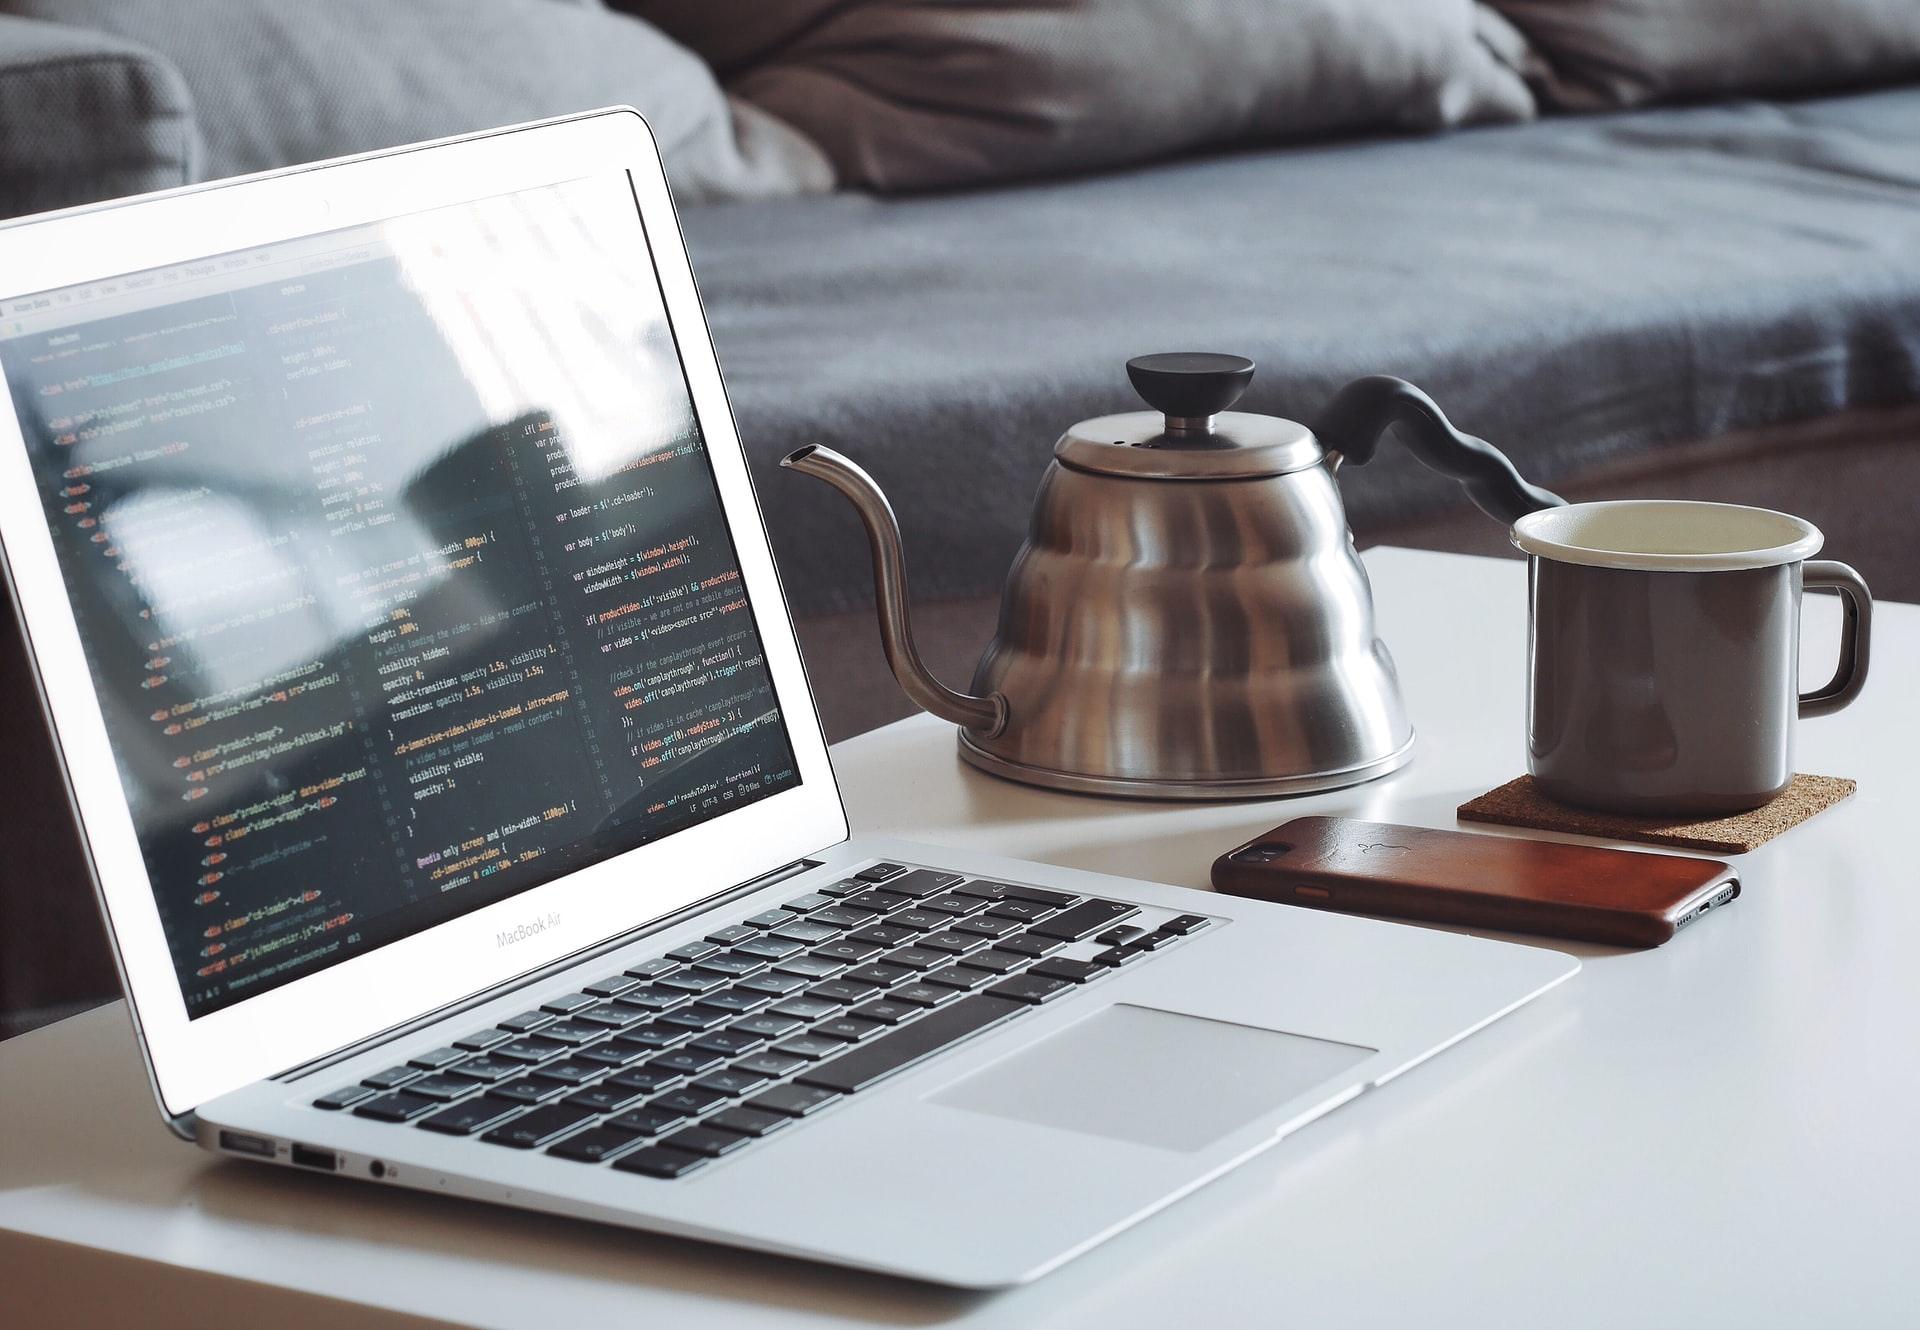 WordPress5.5で削除されたjQuery Migrateをサイトに追加するプラグイン「Enable jQuery Migrate Helper」